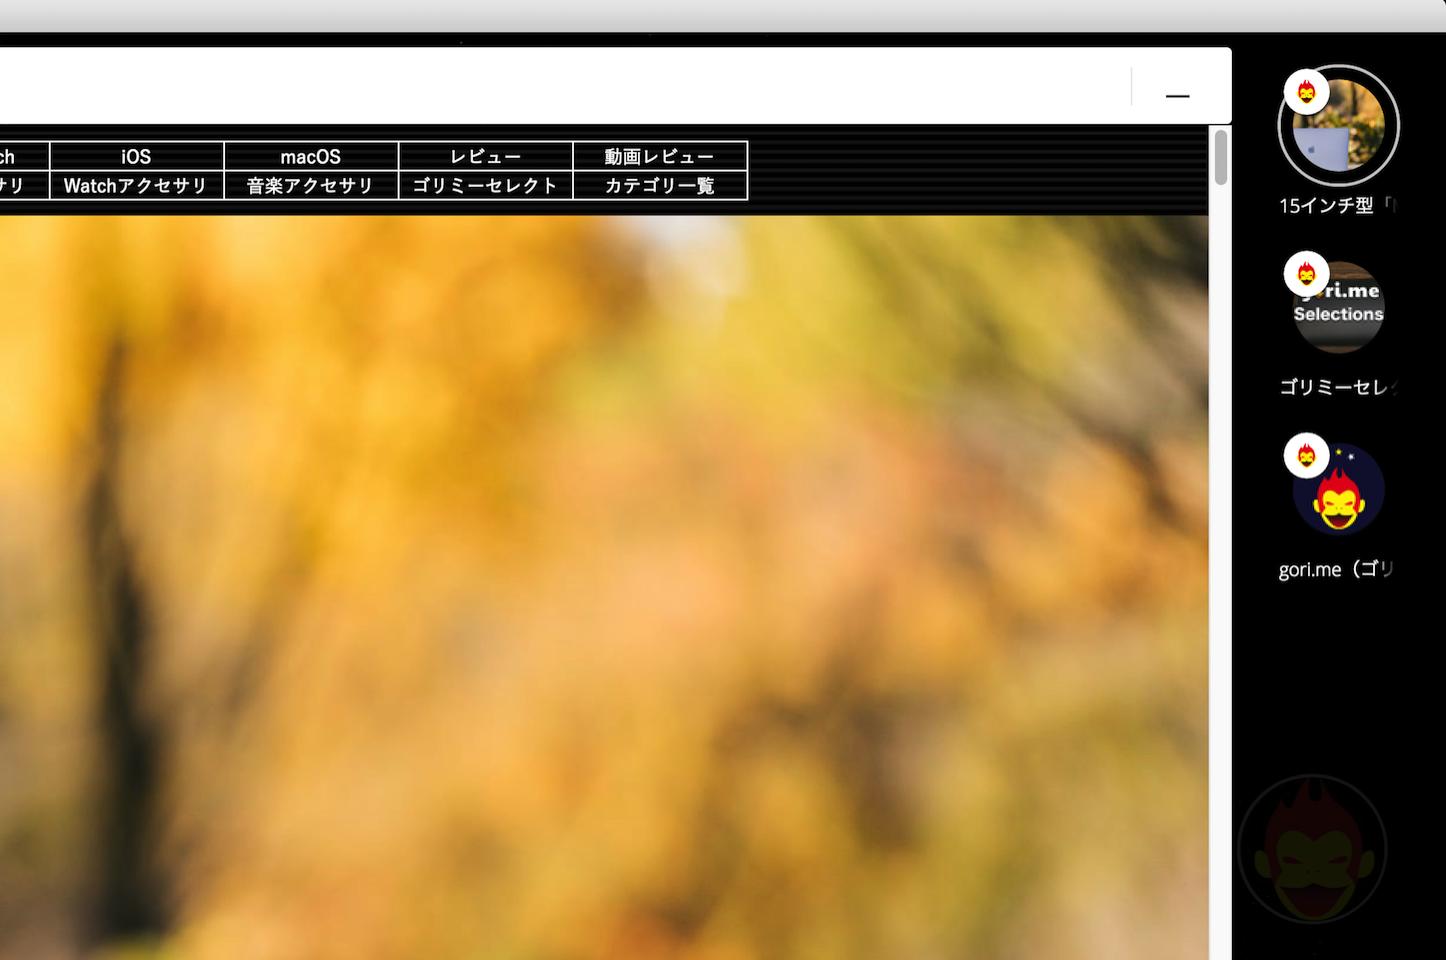 Neon operacom laptop tabs 3